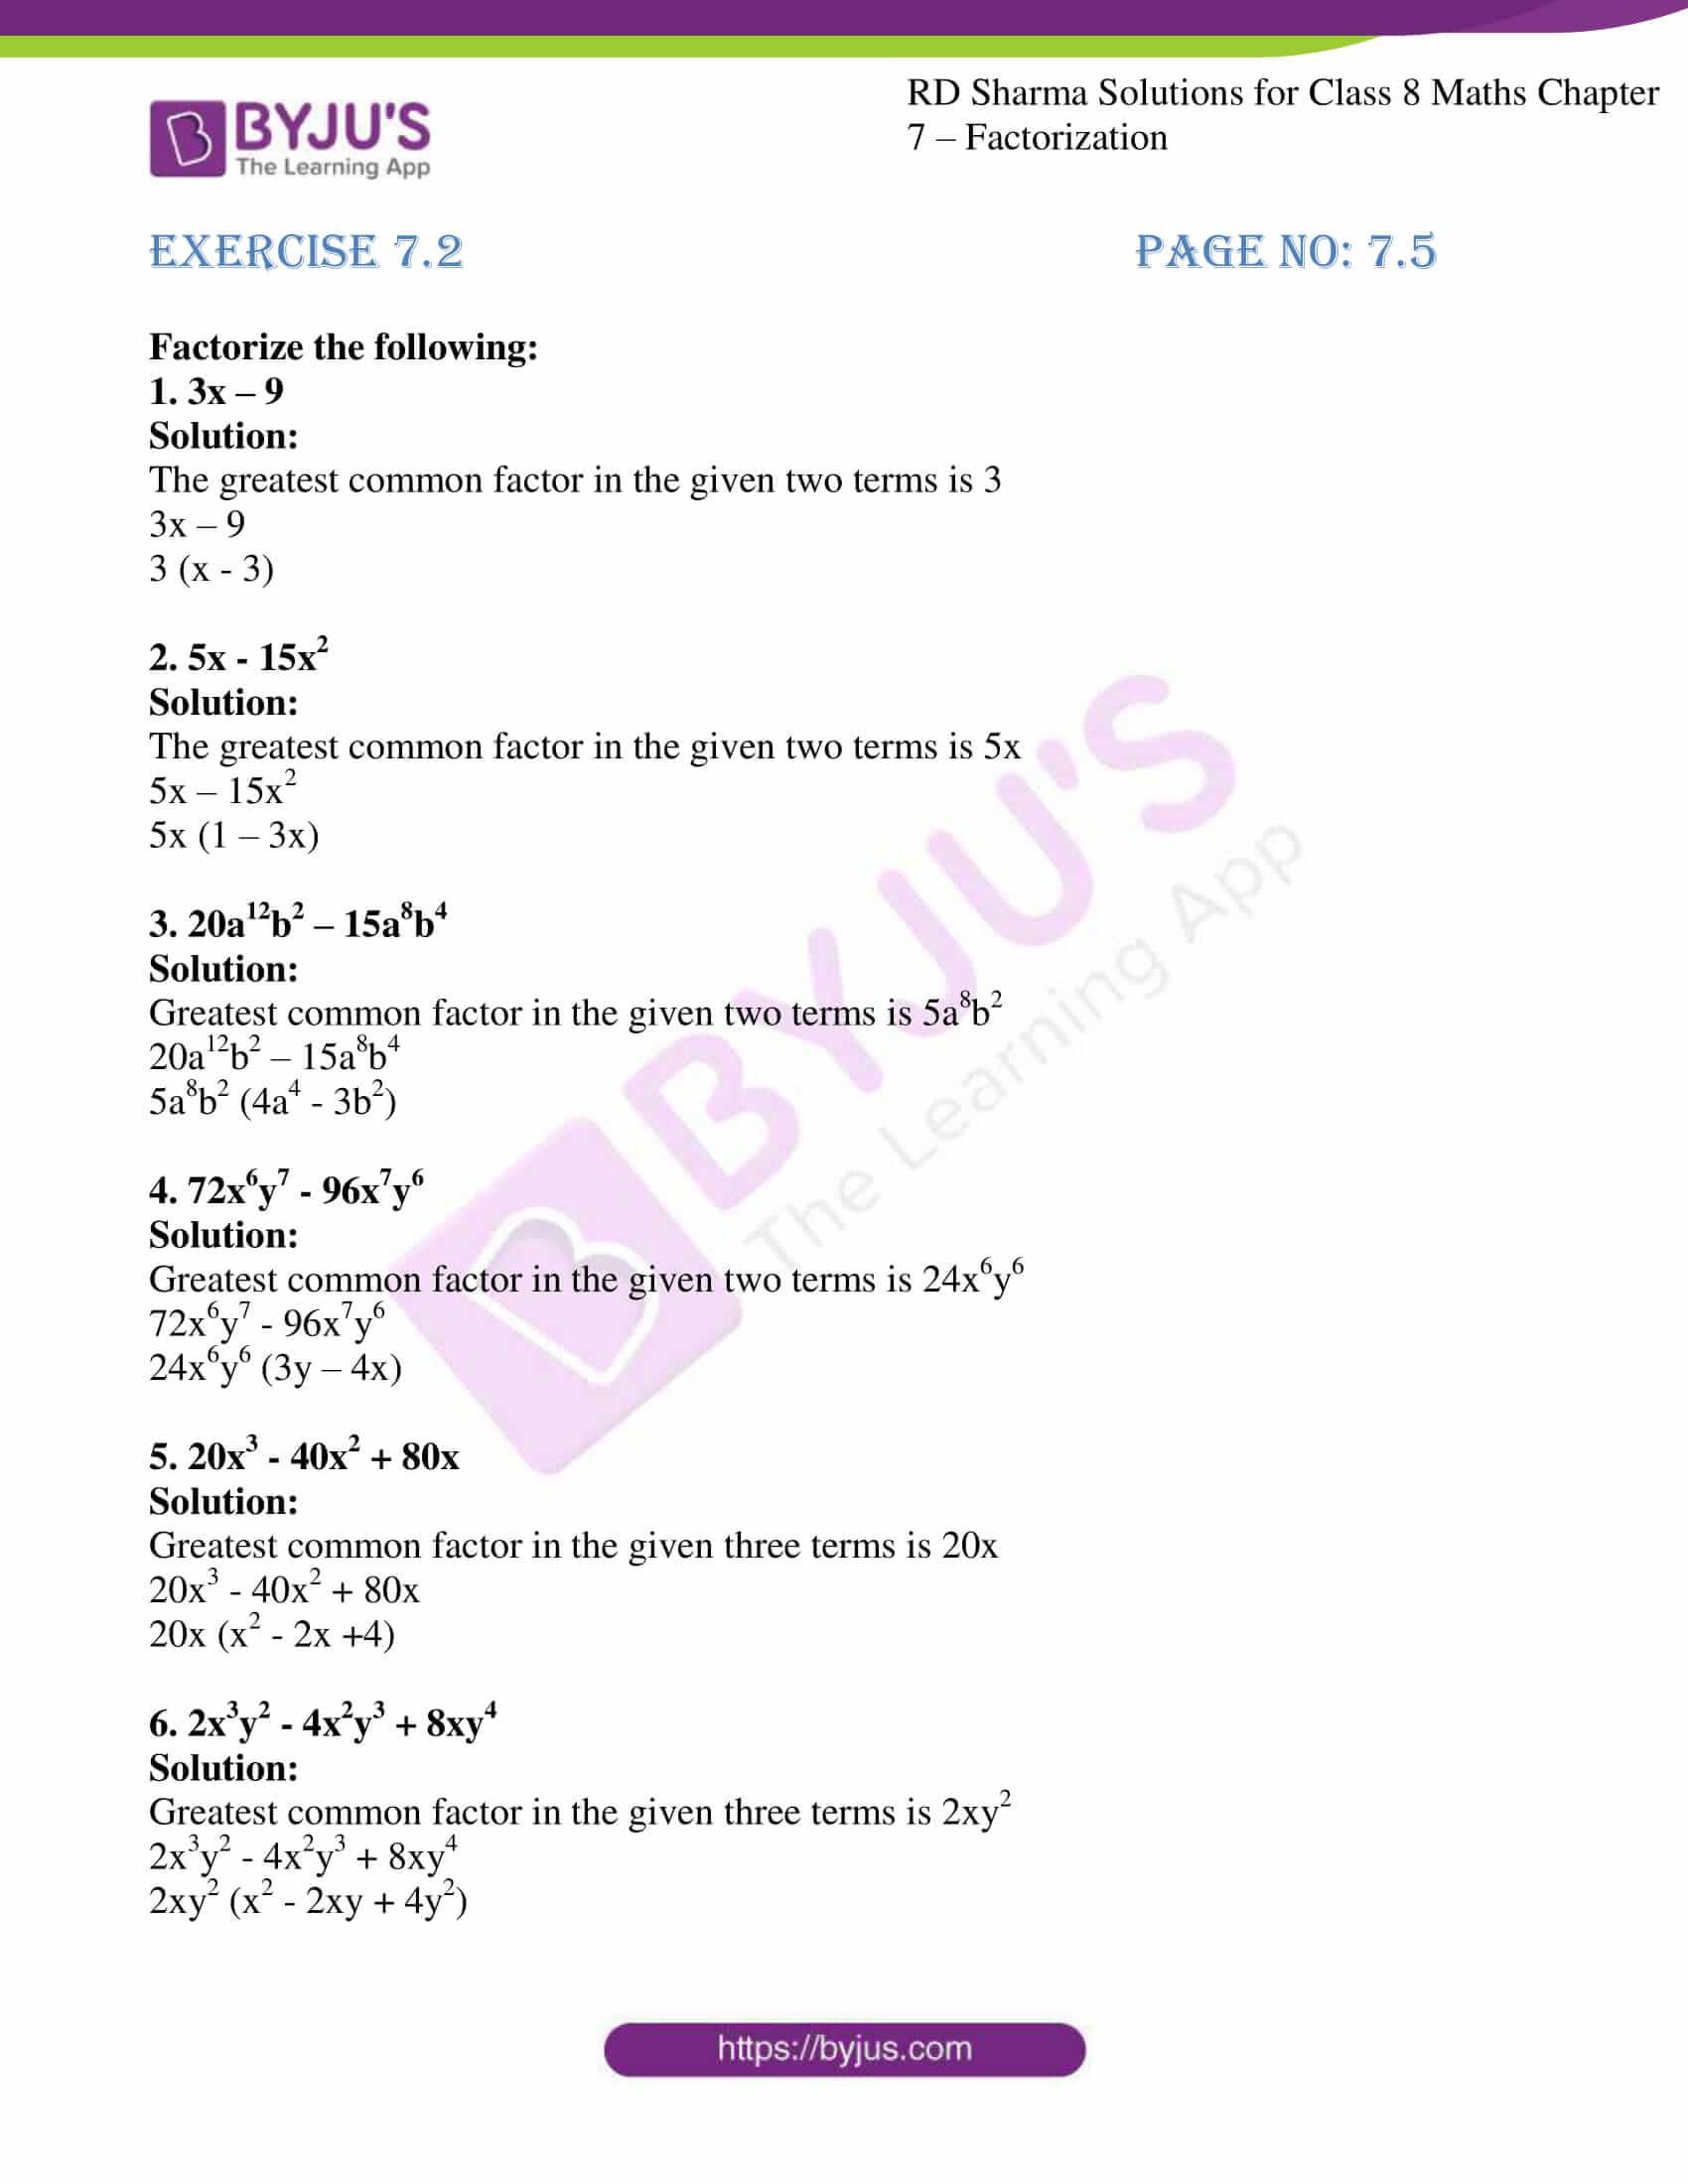 rd sharma class 8 maths chapter 7 exercise 2 1